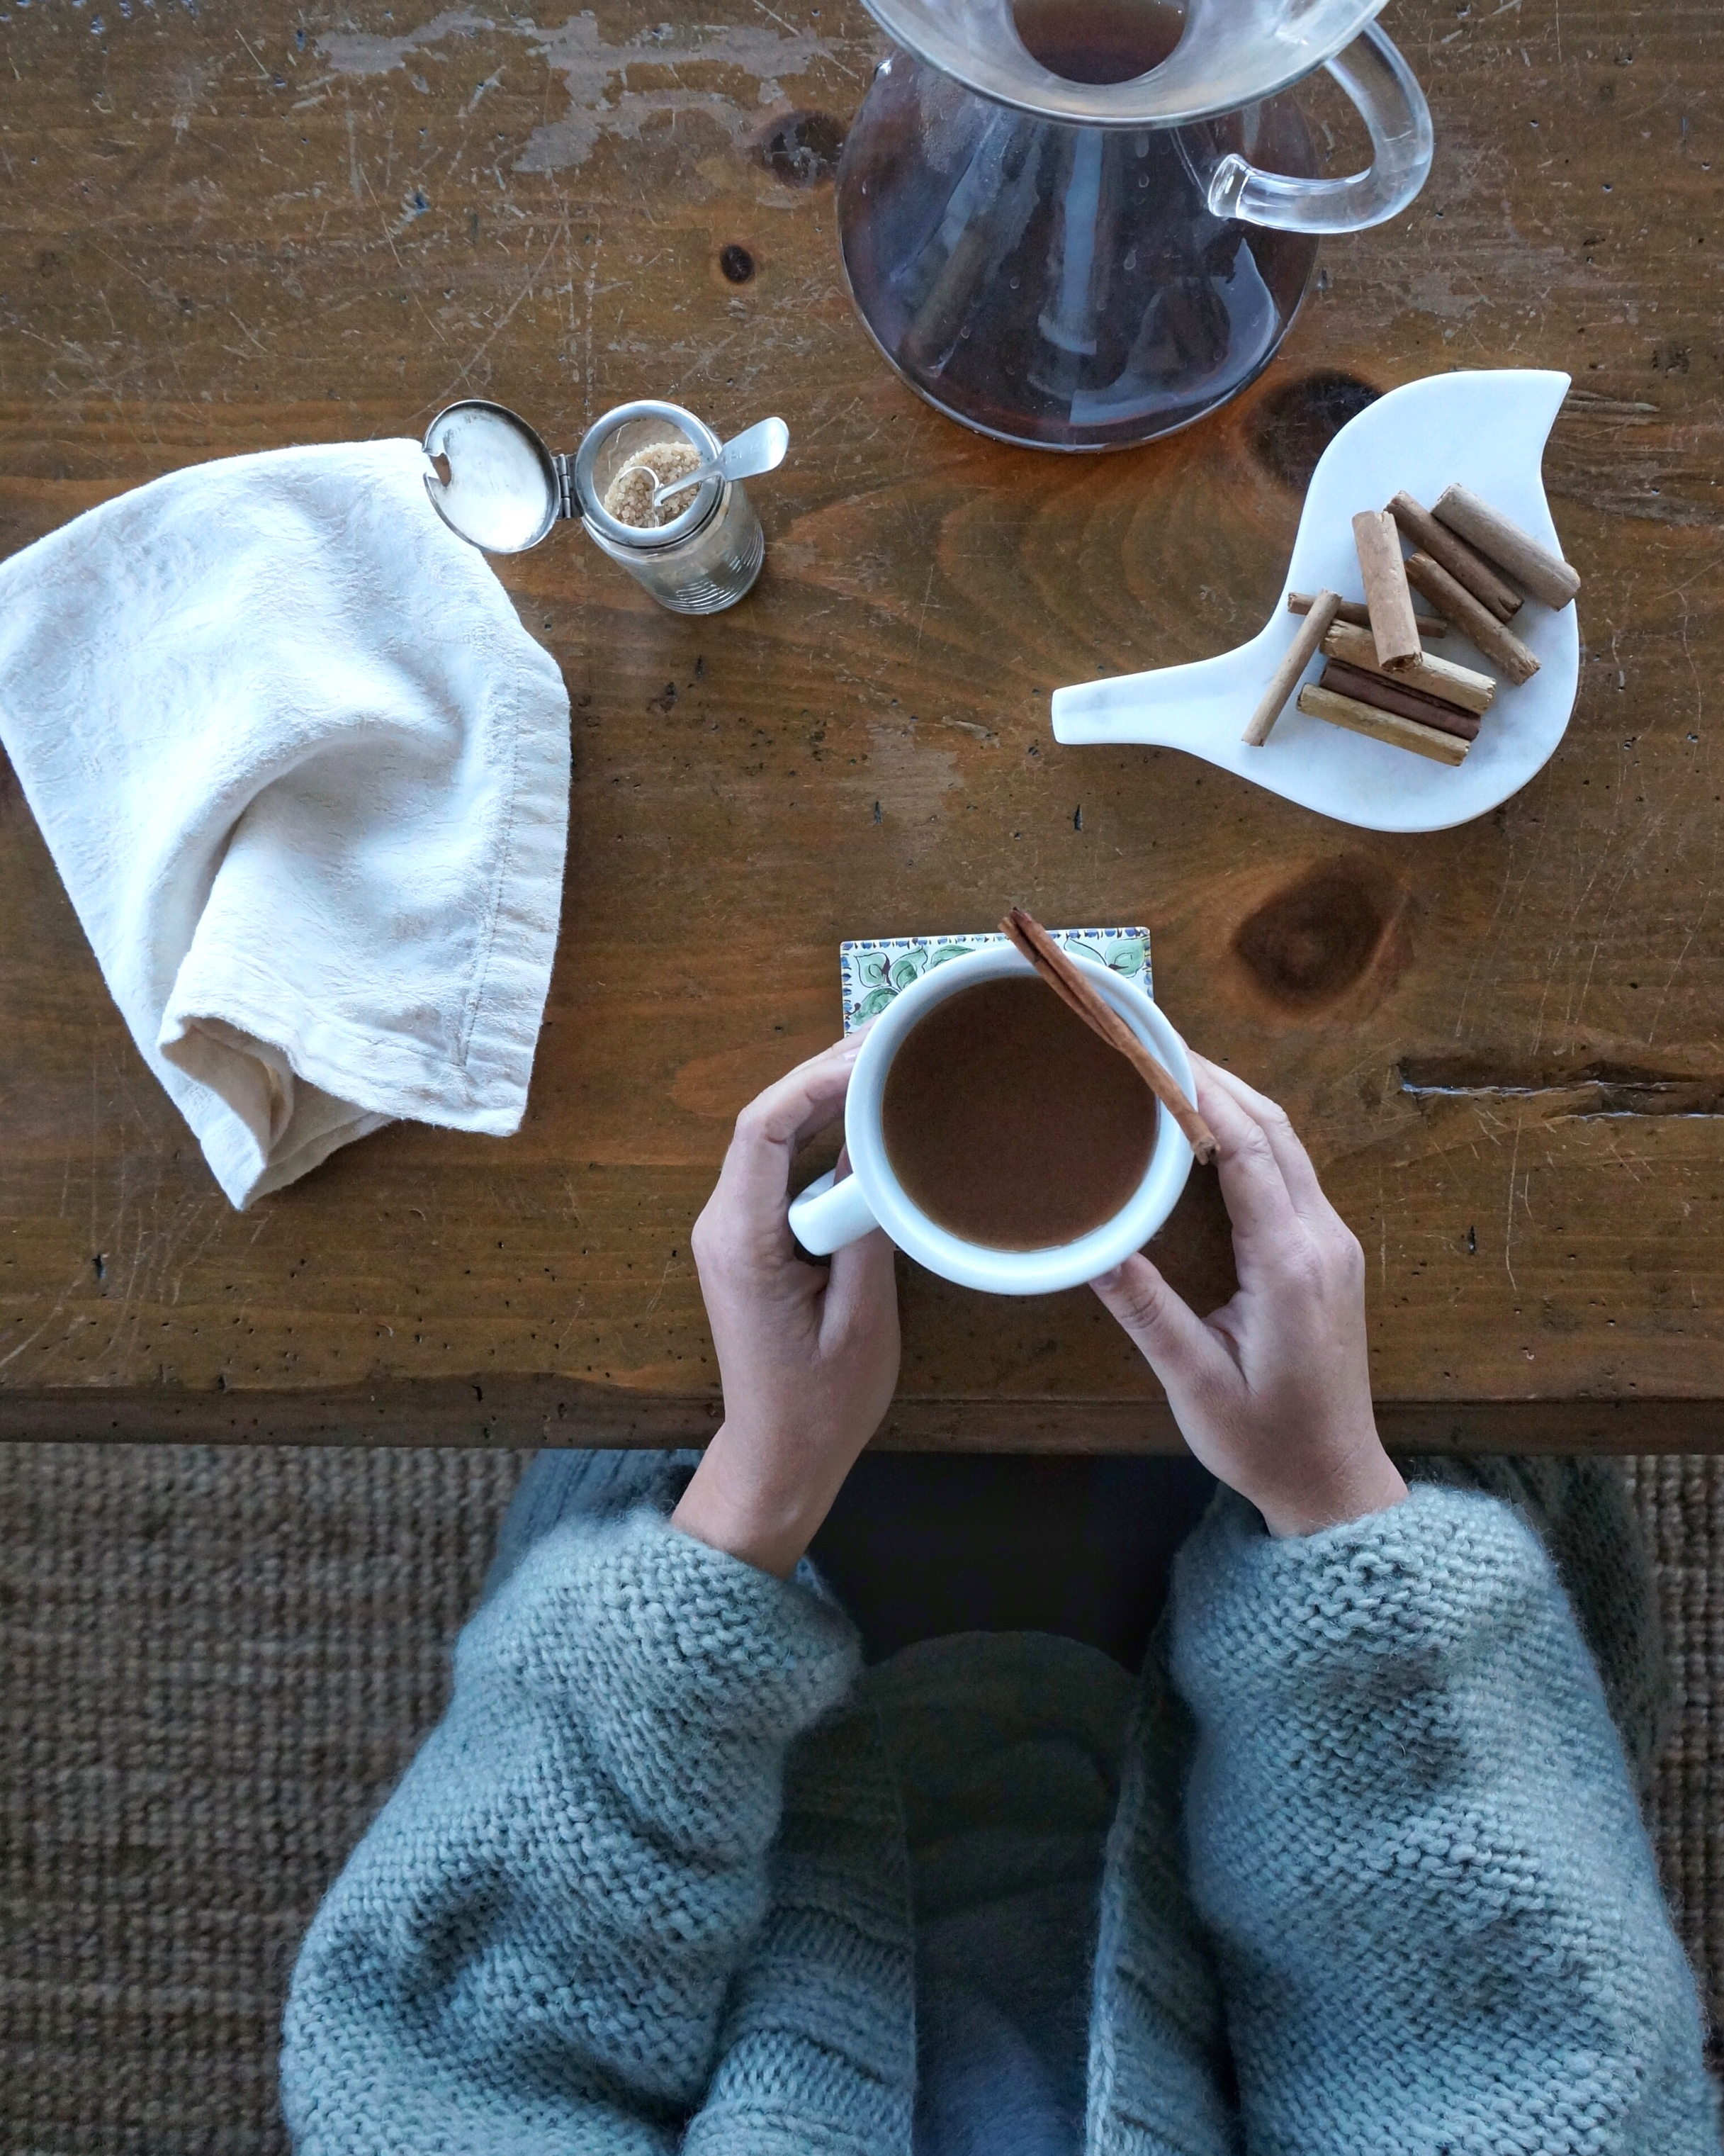 3 healthier hot drink recipes